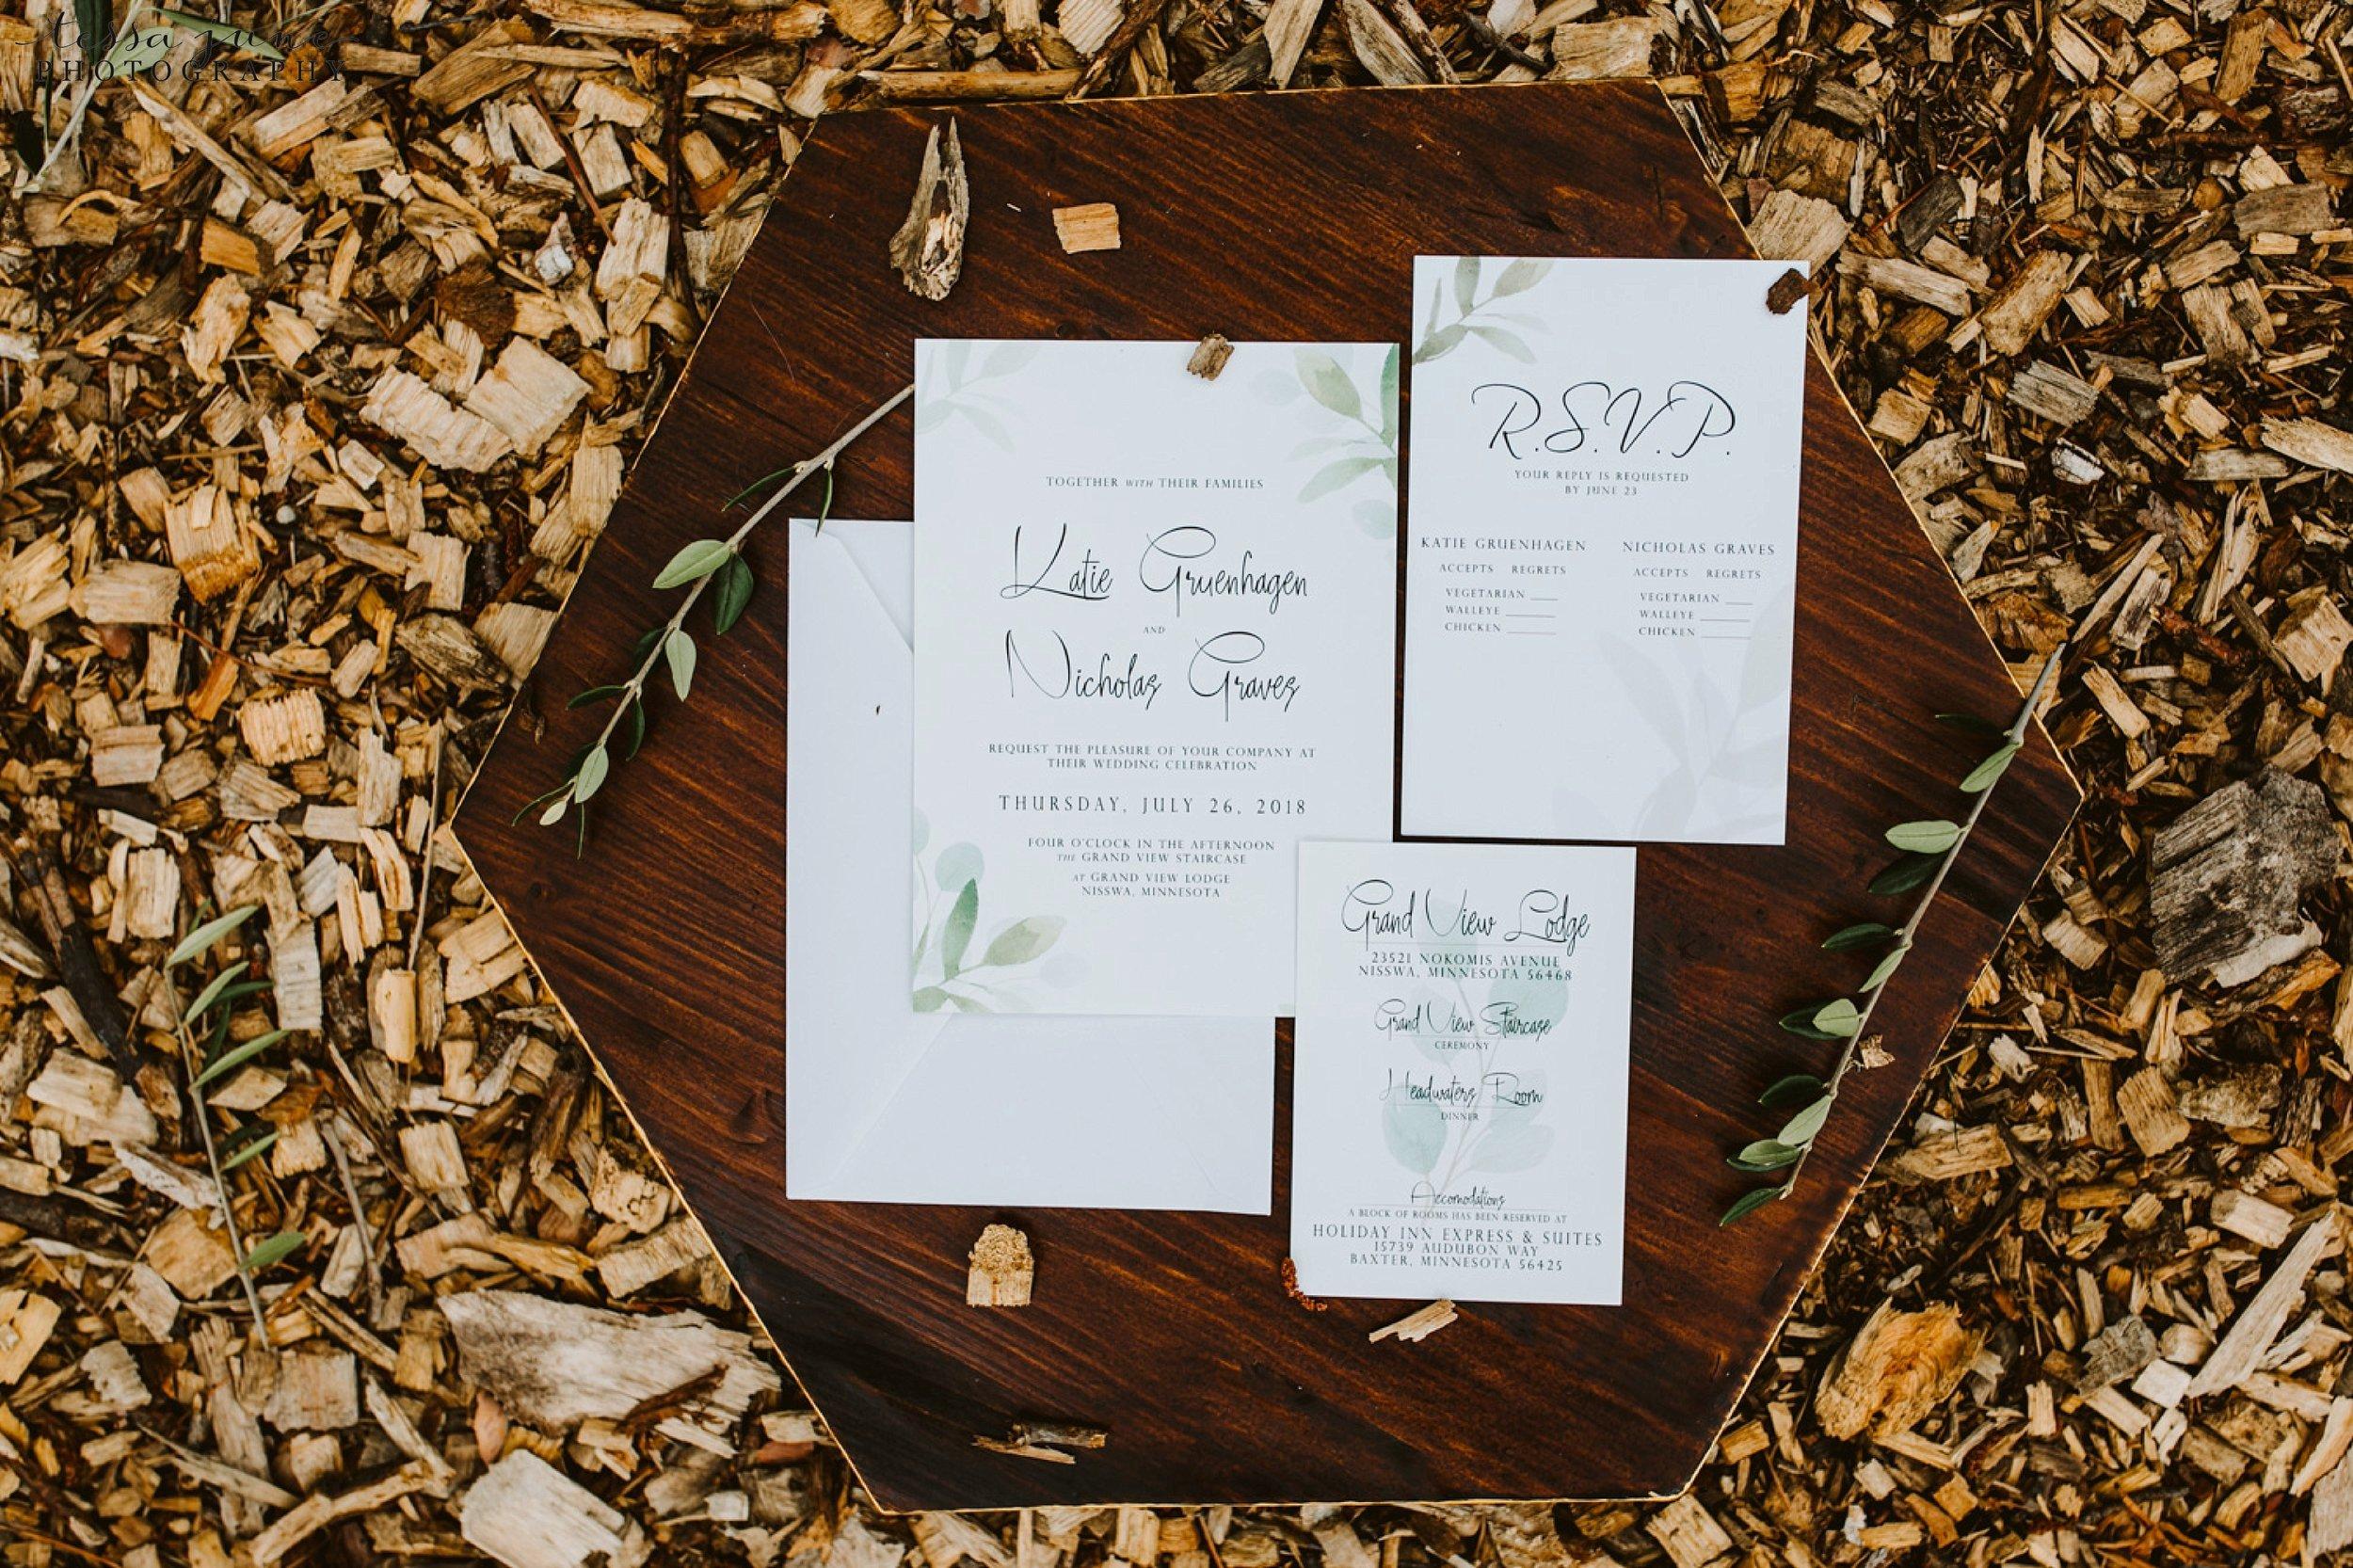 grandview-lodge-wedding-nisswa-minnesota-forest-stationary